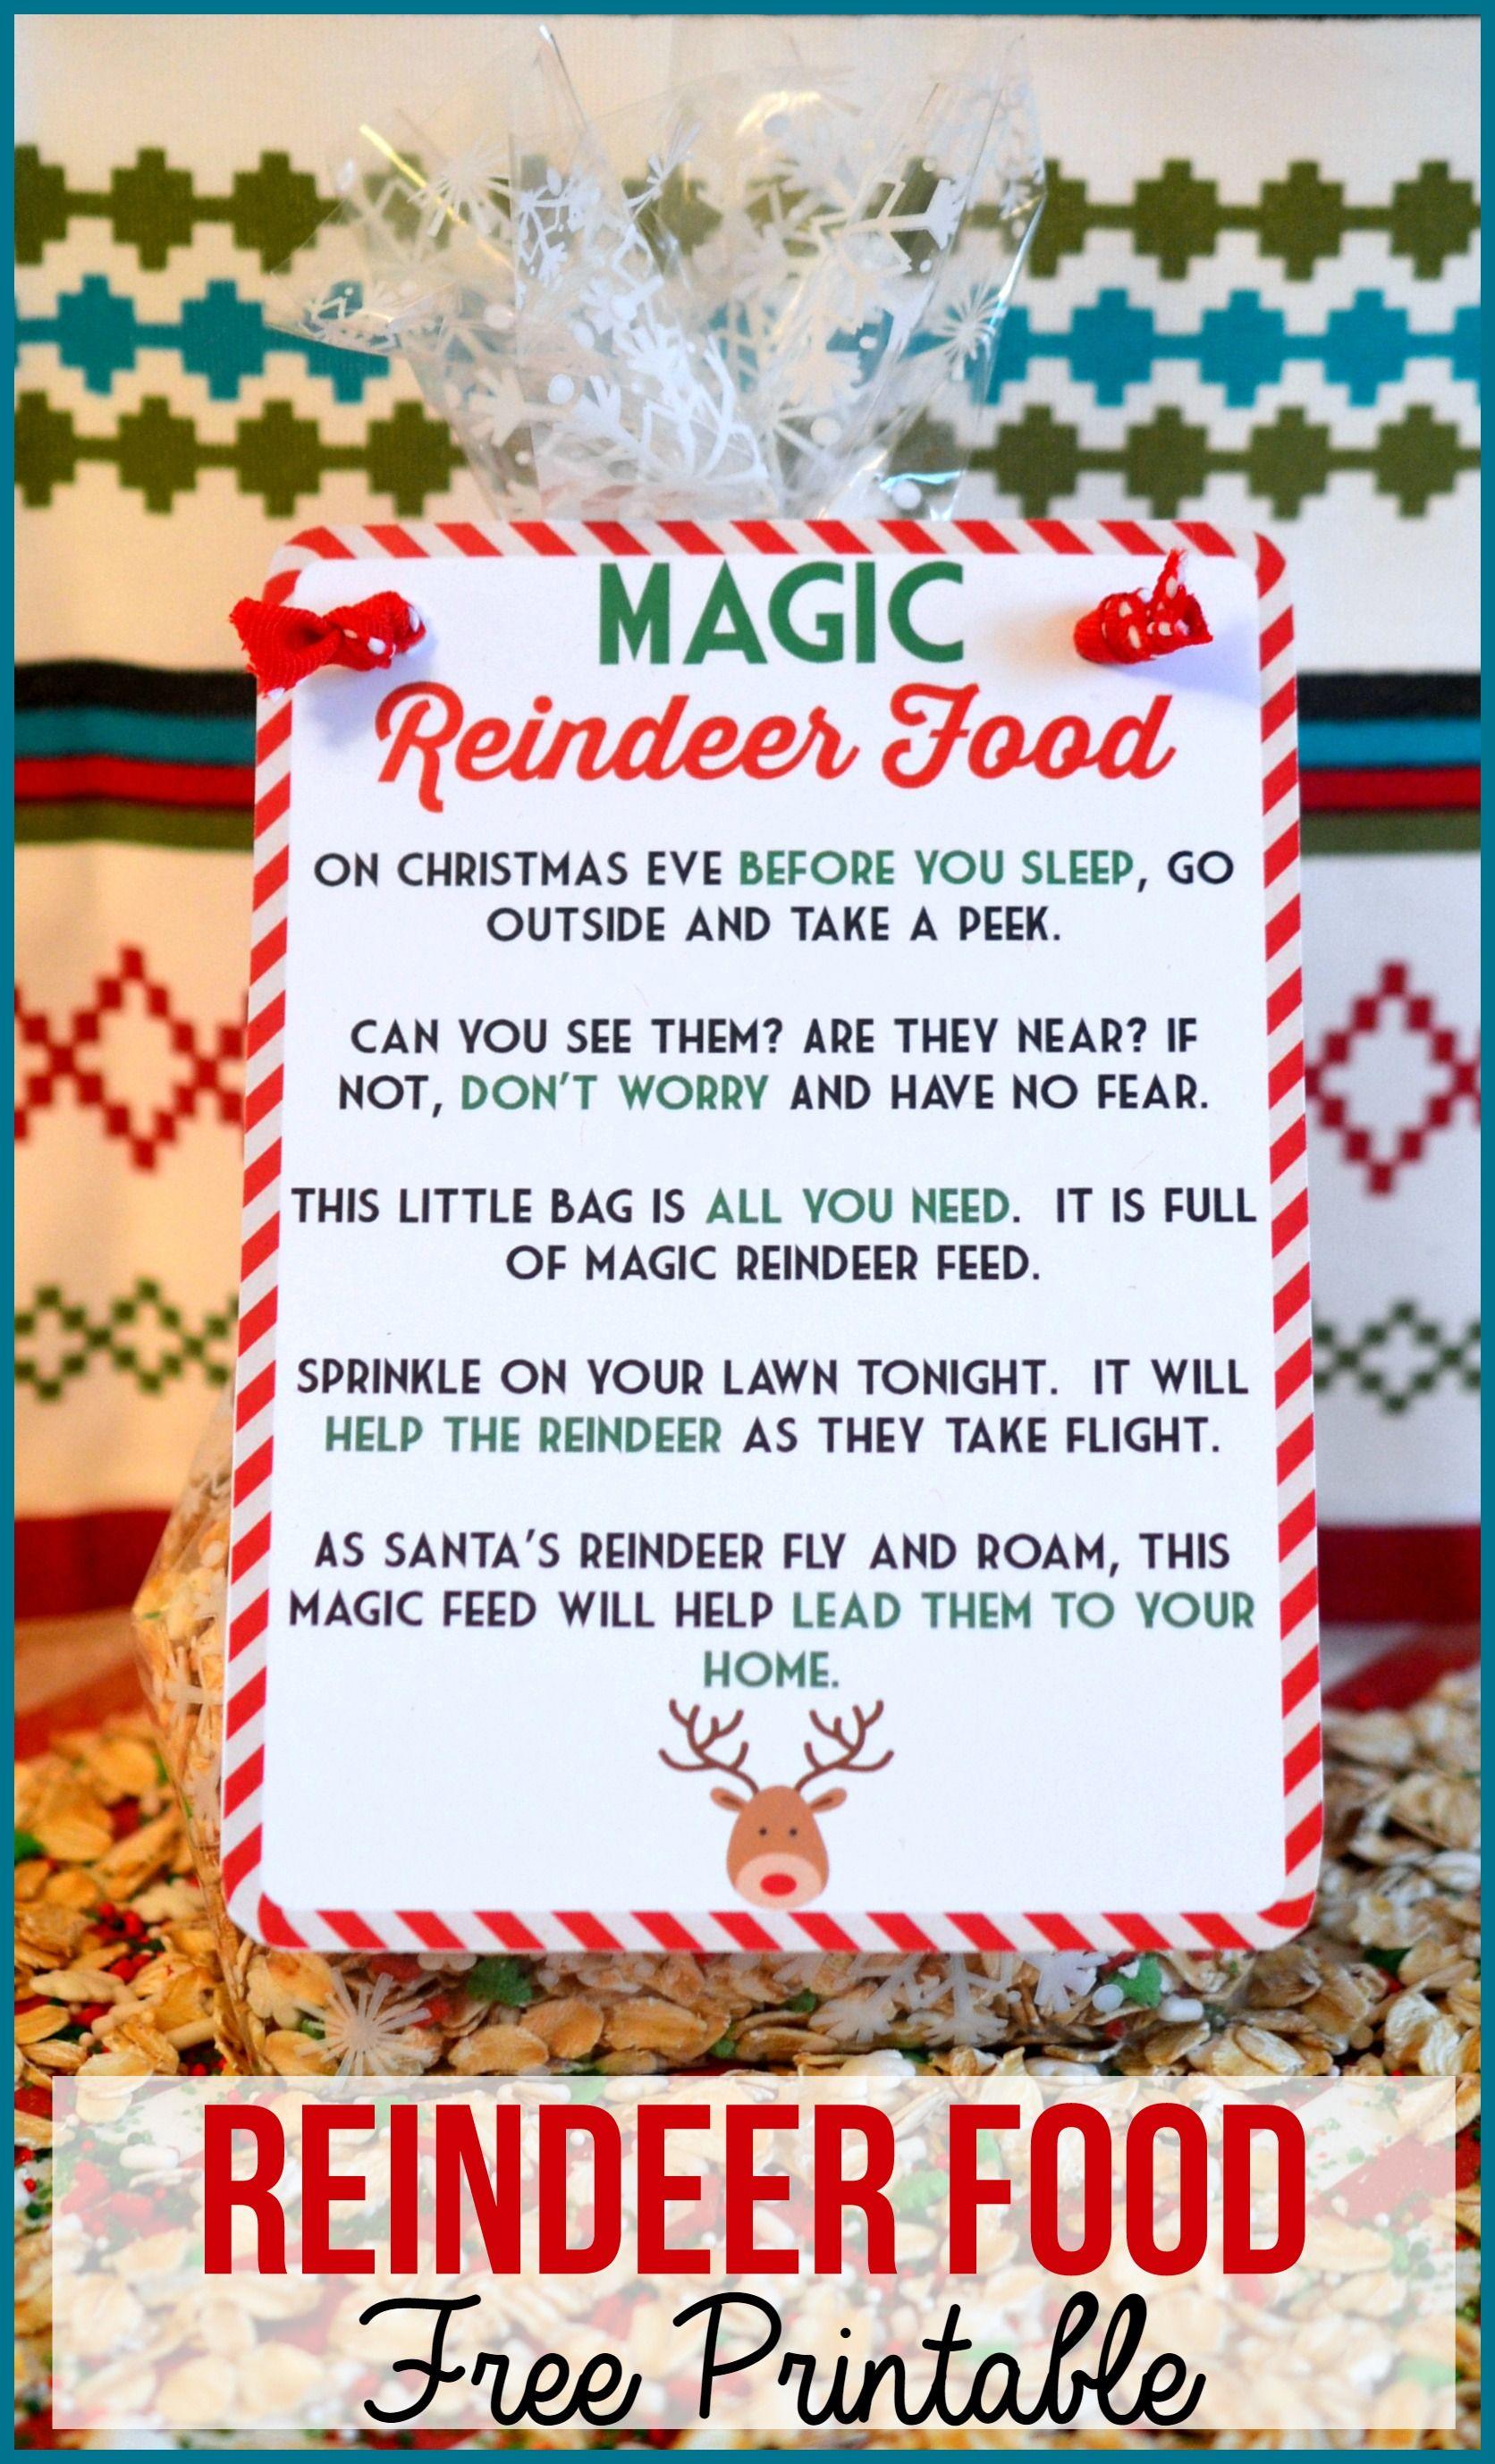 Magic Reindeer Food Poem & Free Printable #reindeerfoodrecipe